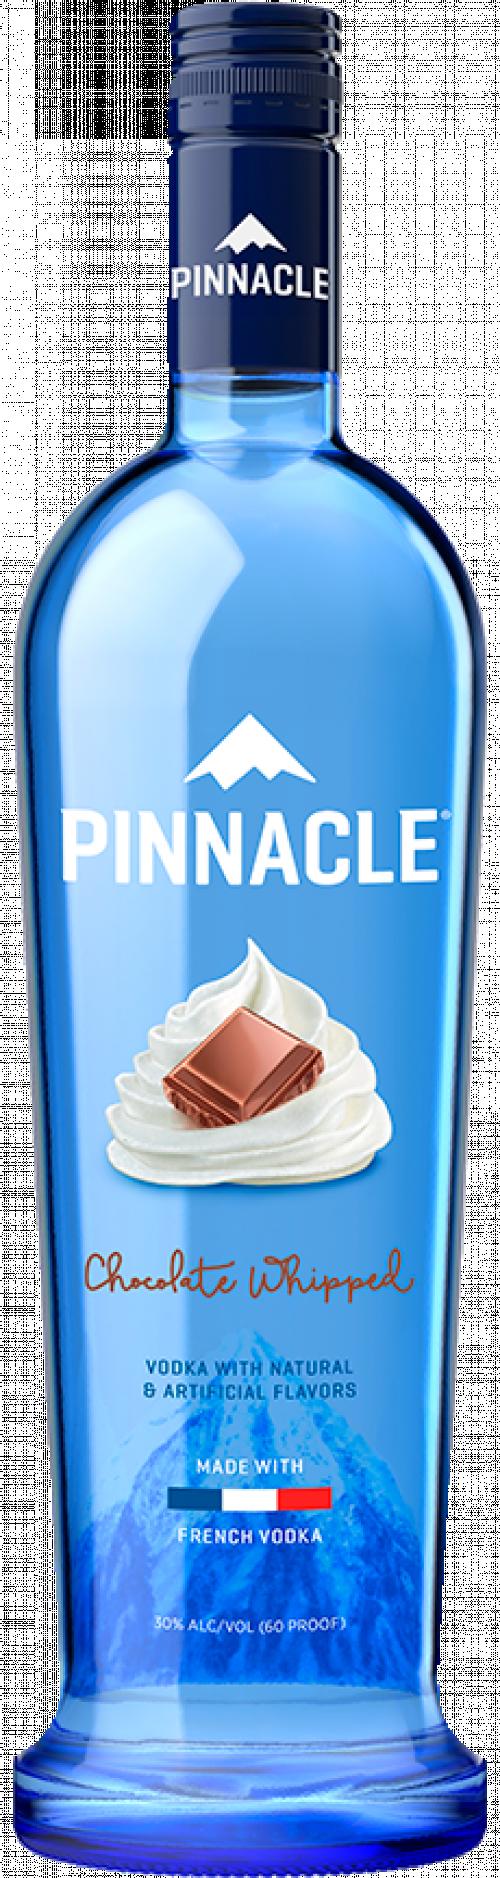 Pinnacle Chocolate Whipped 1.75L